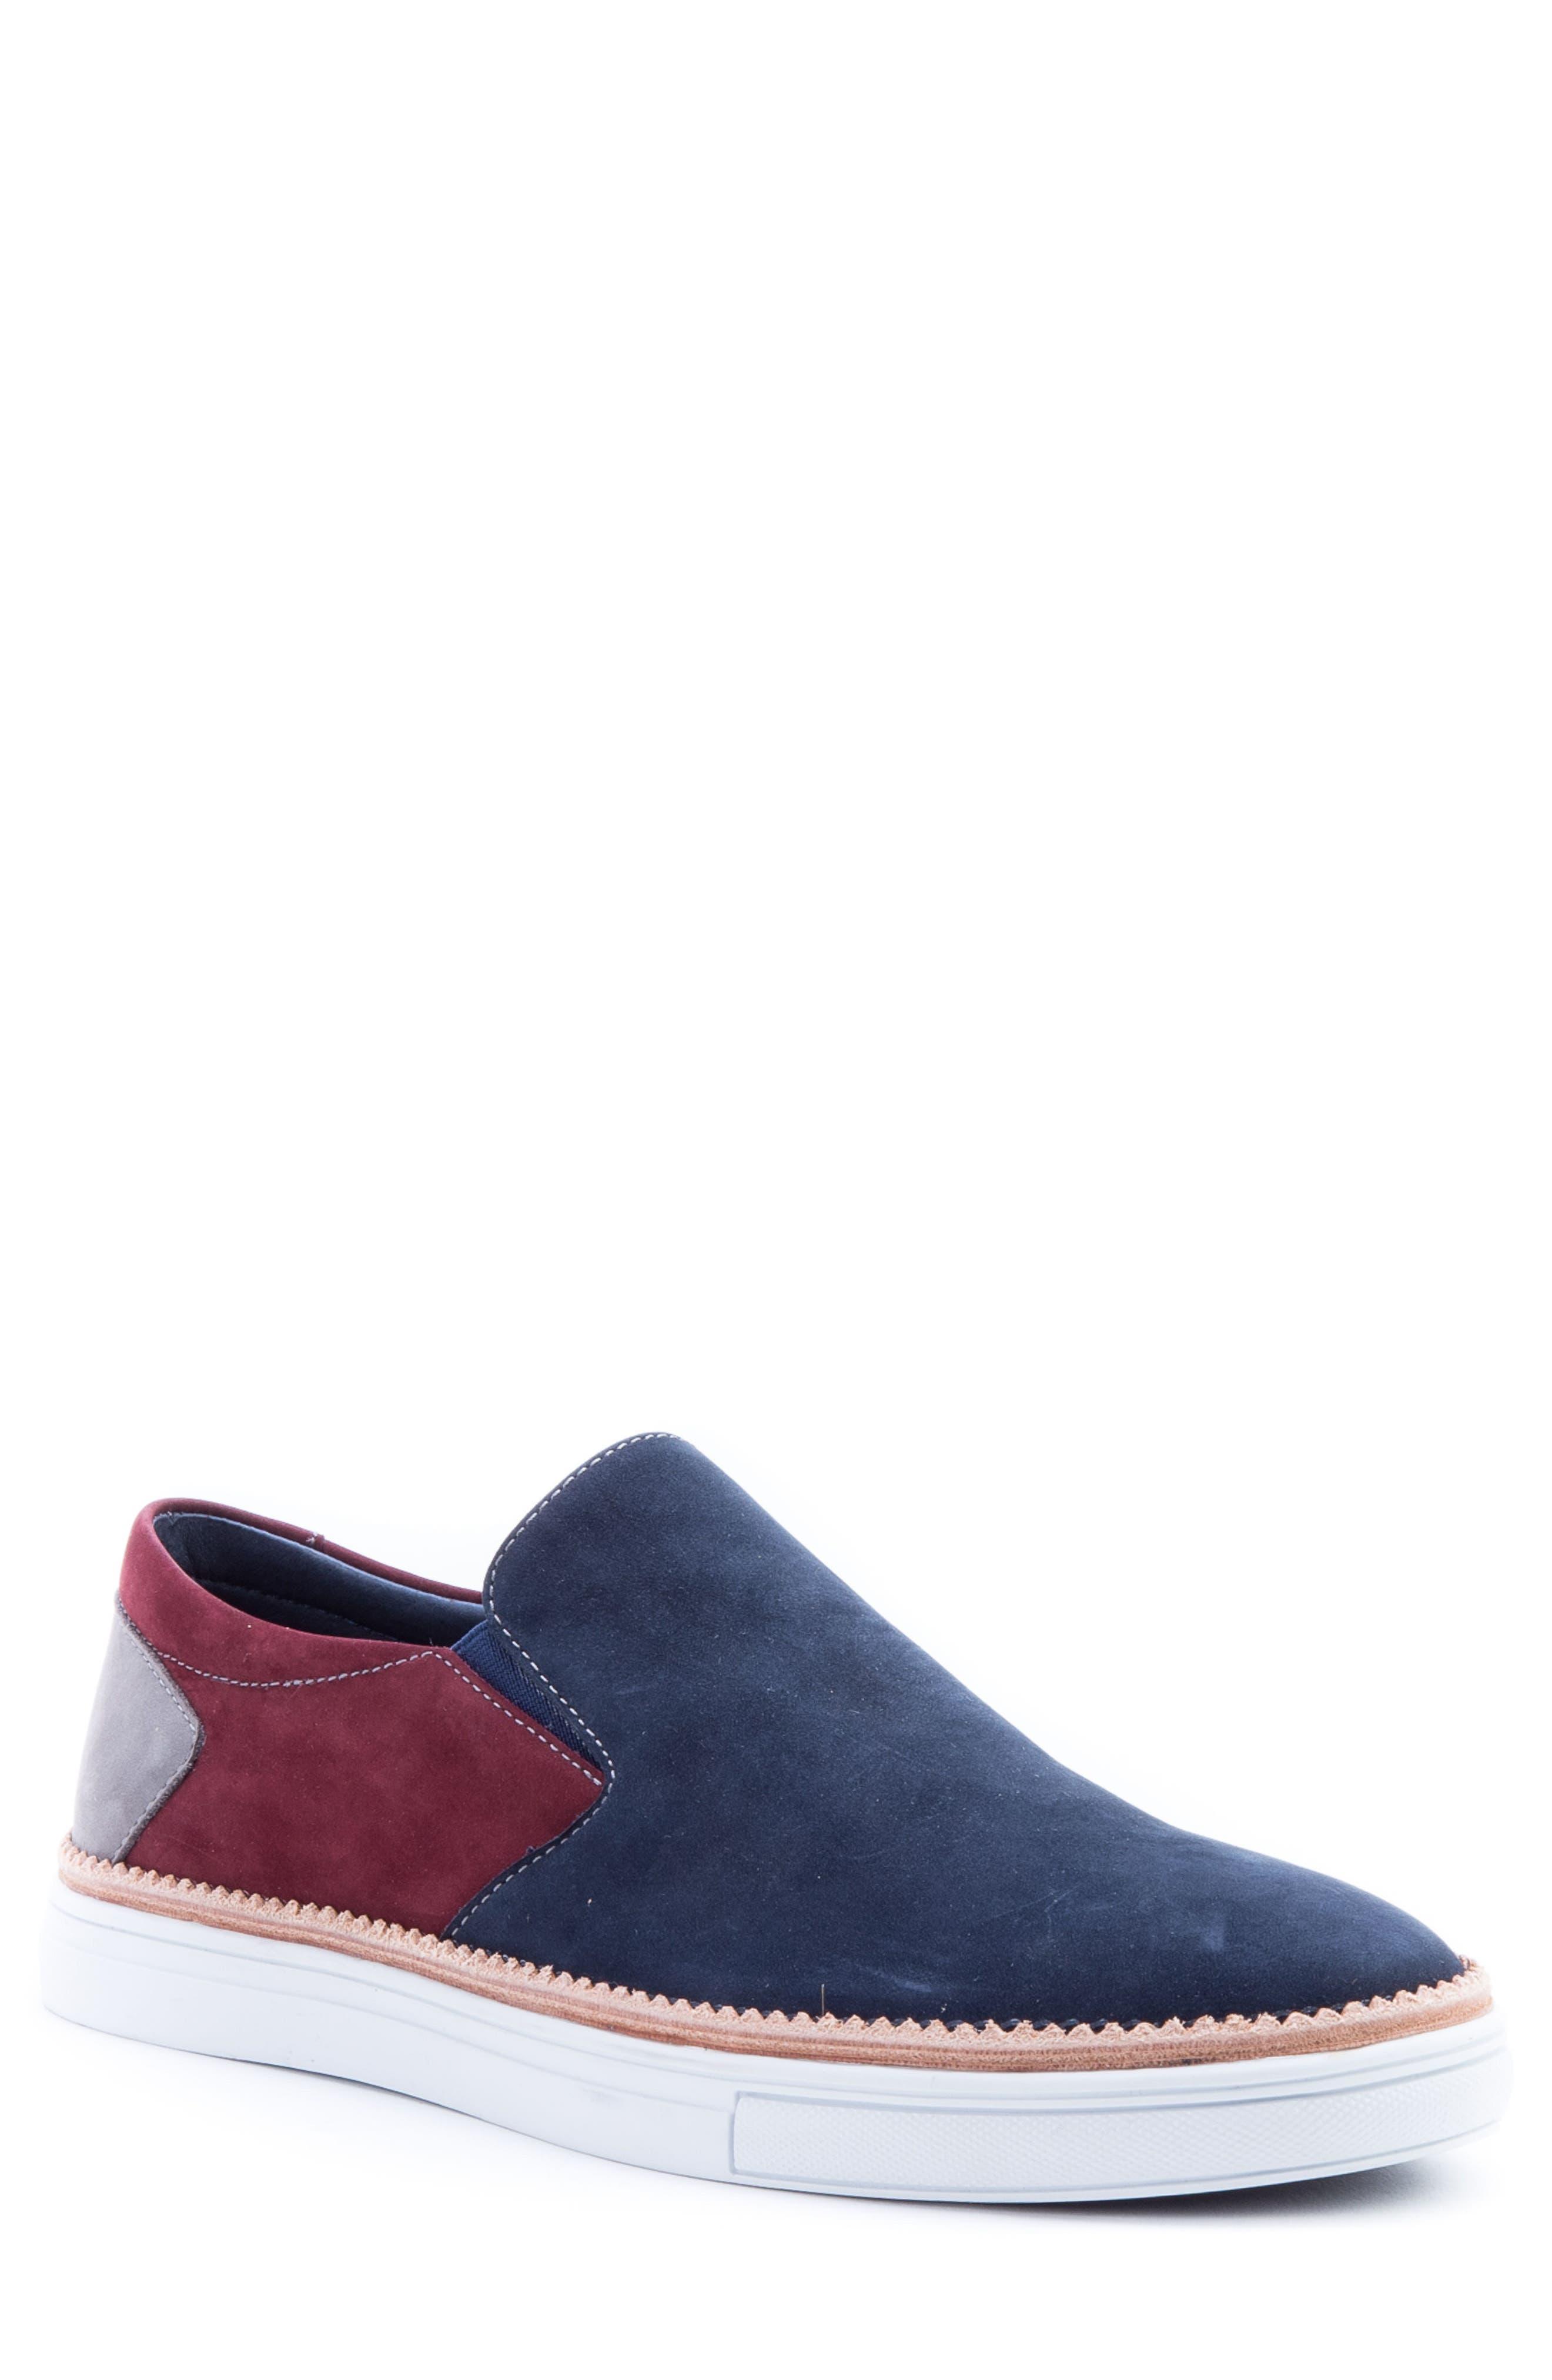 Zanzara Men's Rivera Colorblocked Slip-On Sneaker MSY0GFI2UU